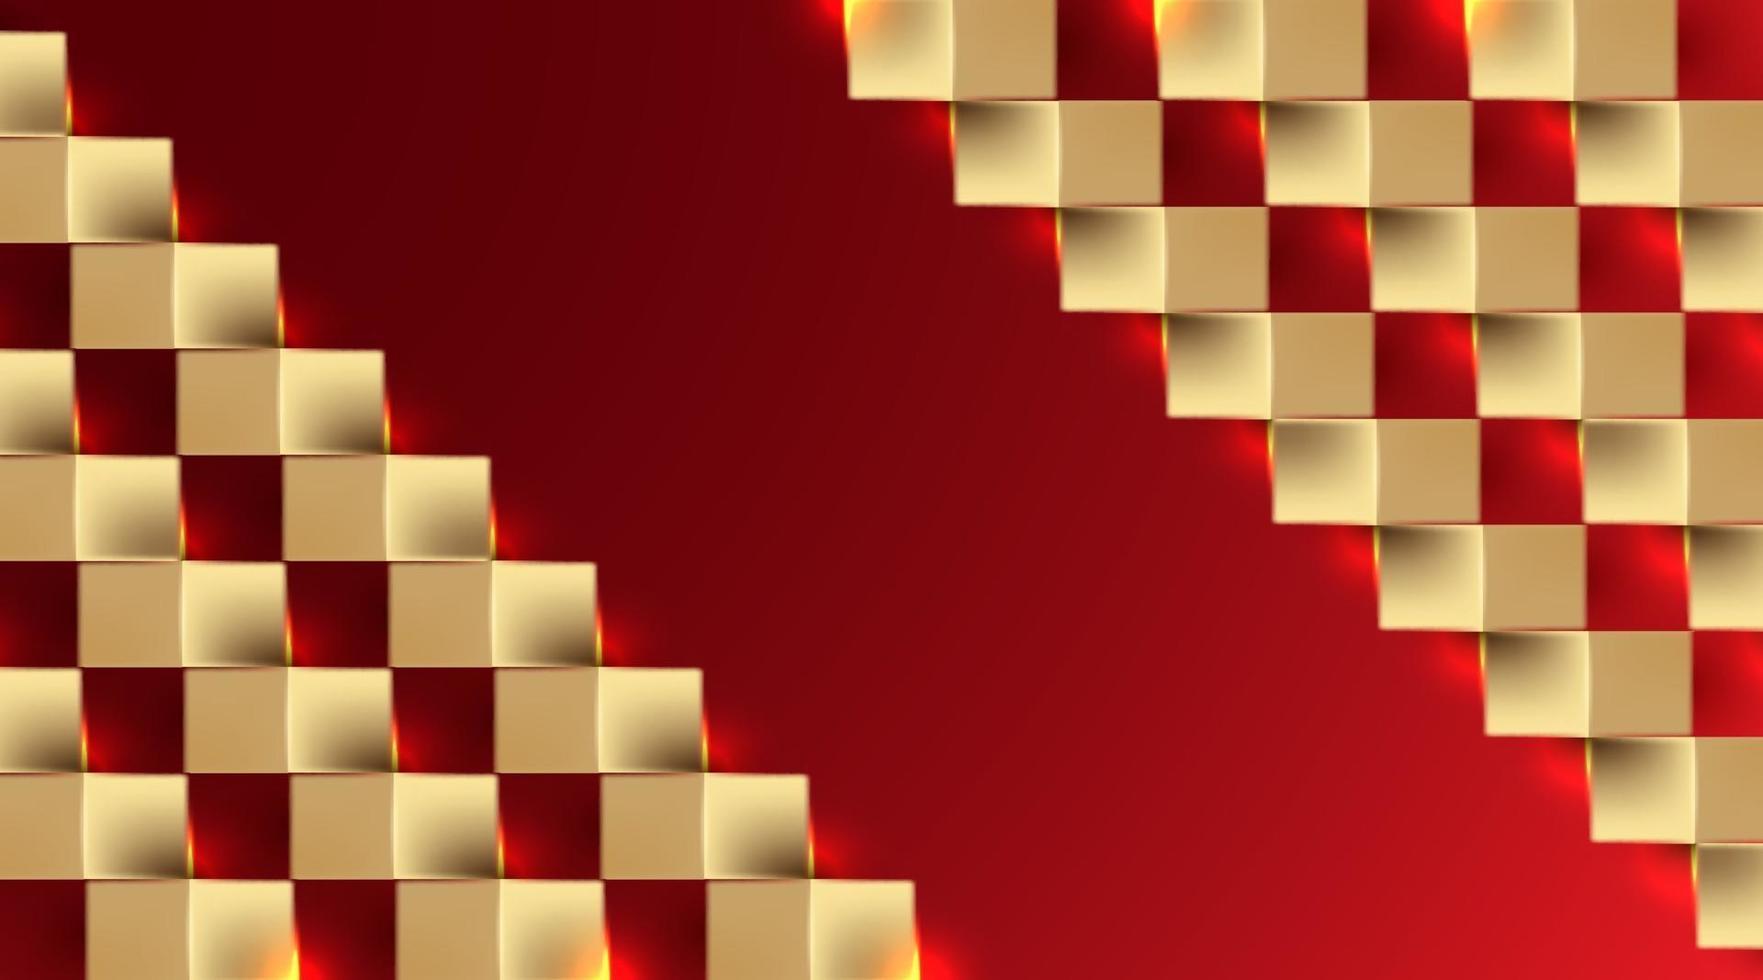 golden square paper art background vector illustration